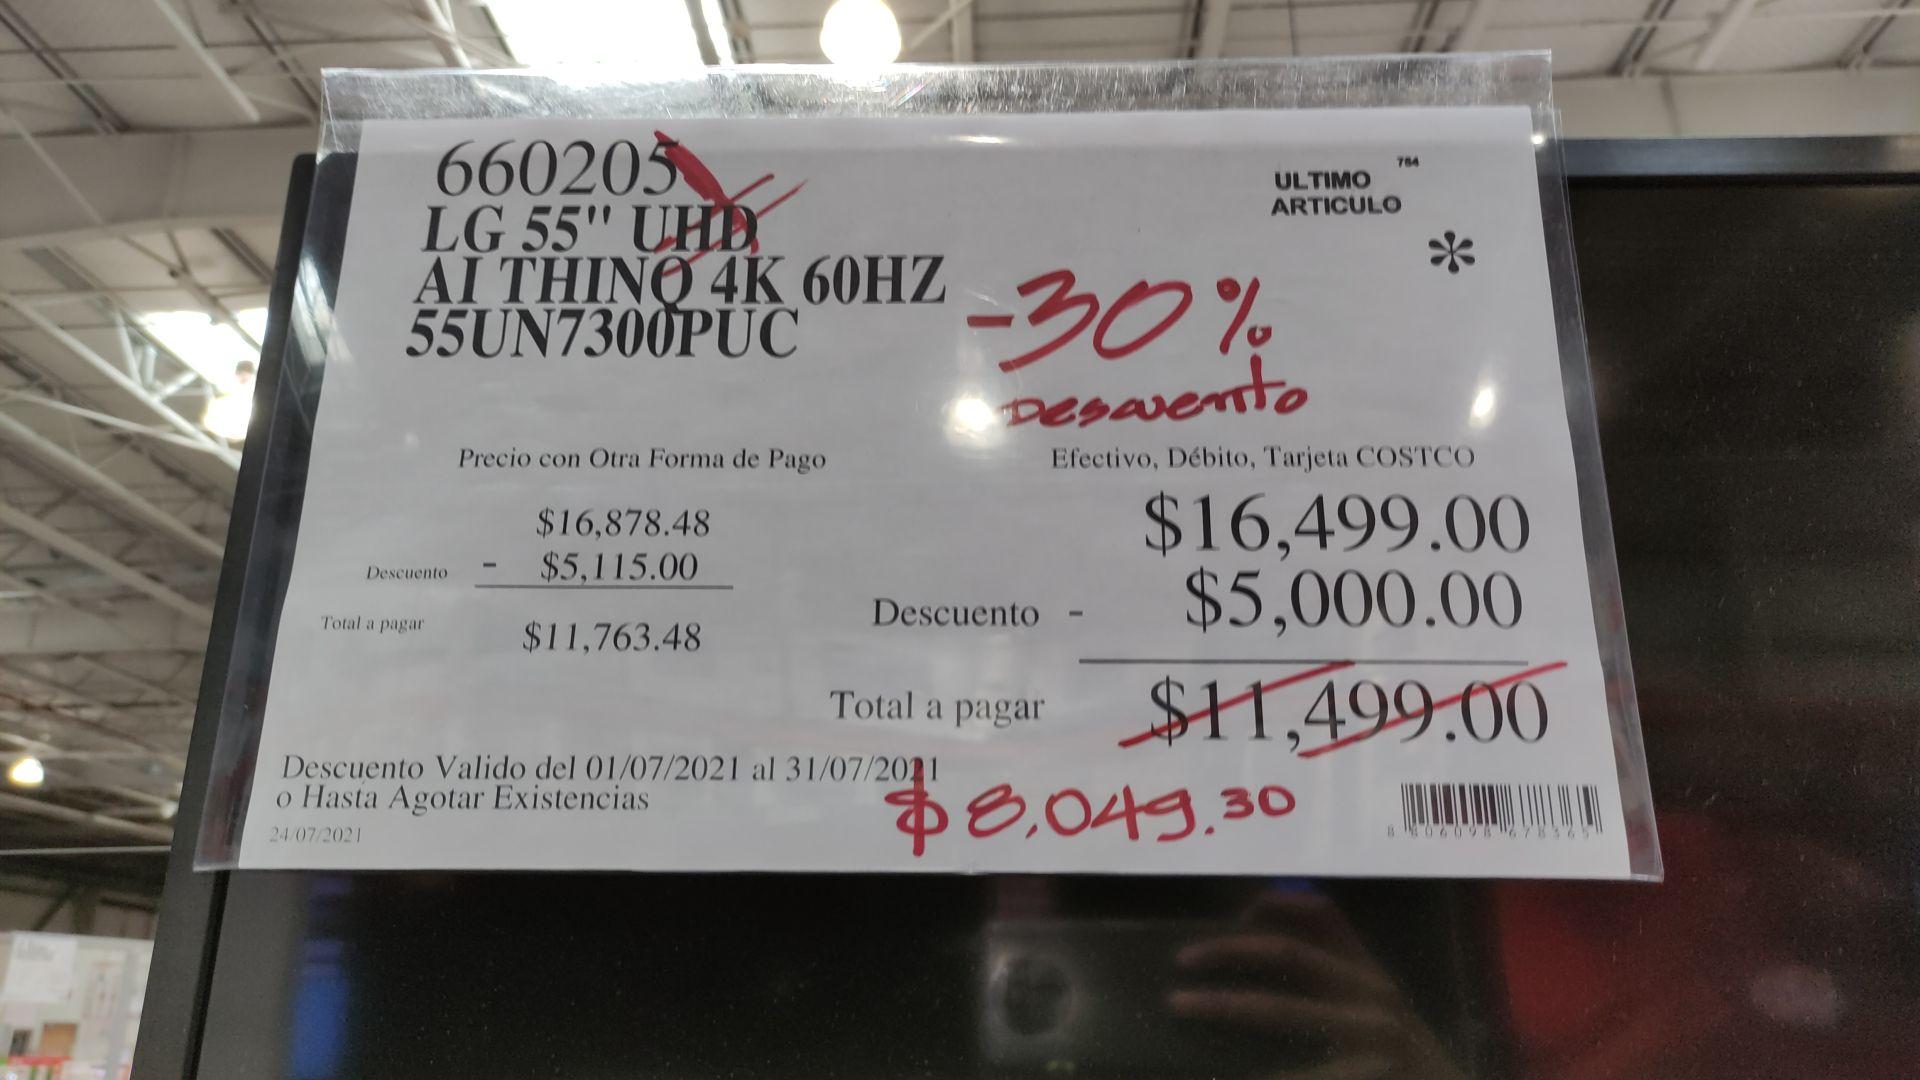 "Costco Ensenada: LG 55"" 4k 55UN7300"